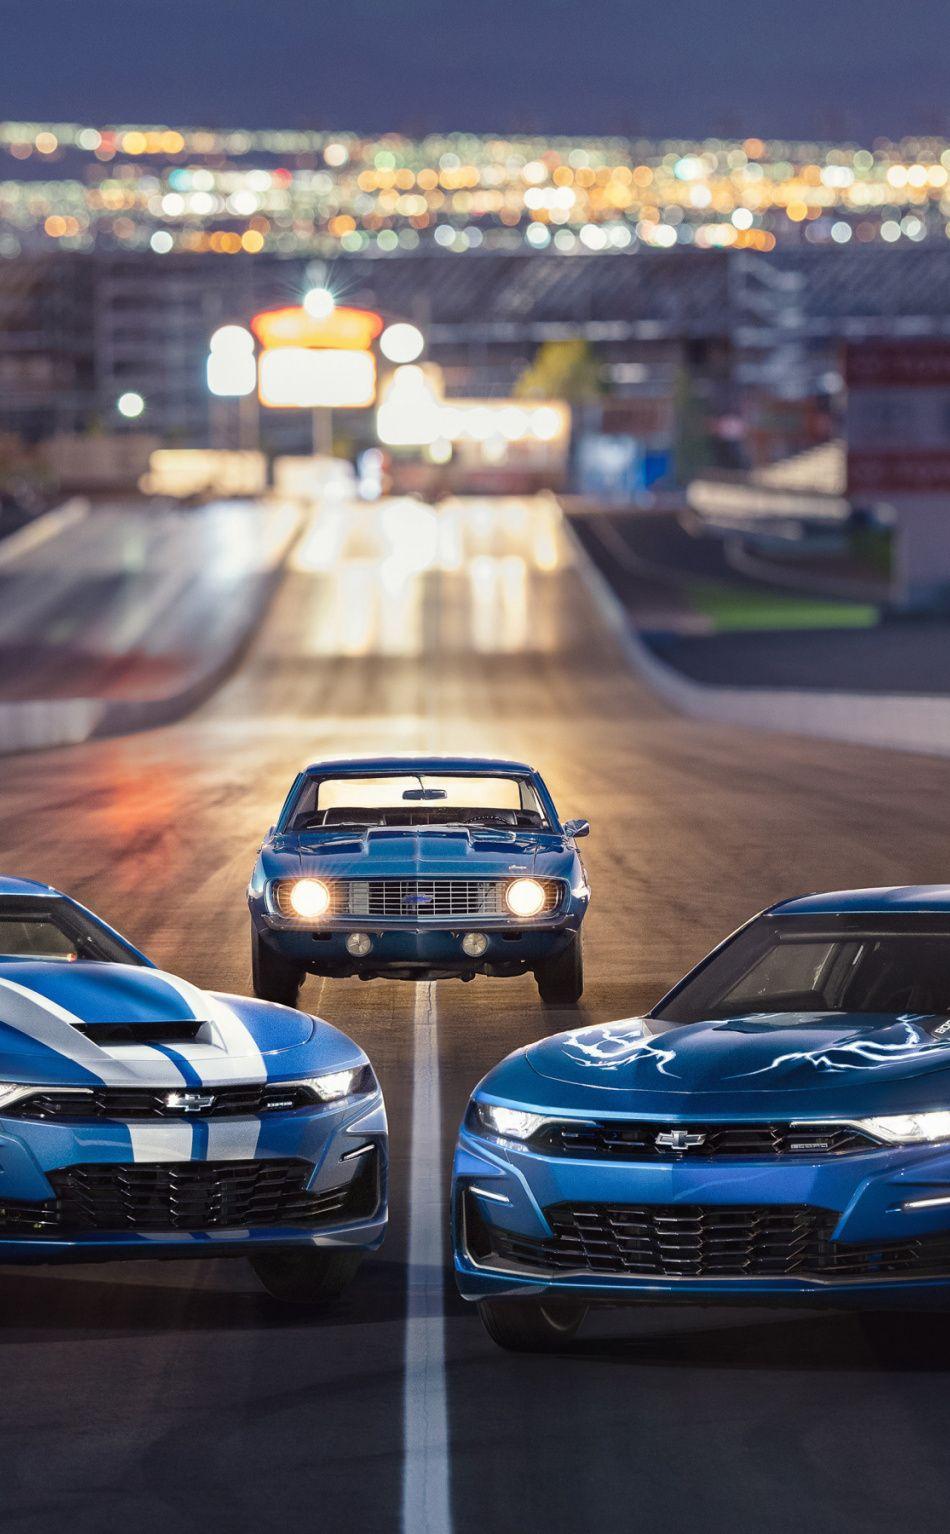 Chevrolet Camaro, blue cars, 21x21 wallpaper   Chevrolet camaro ...